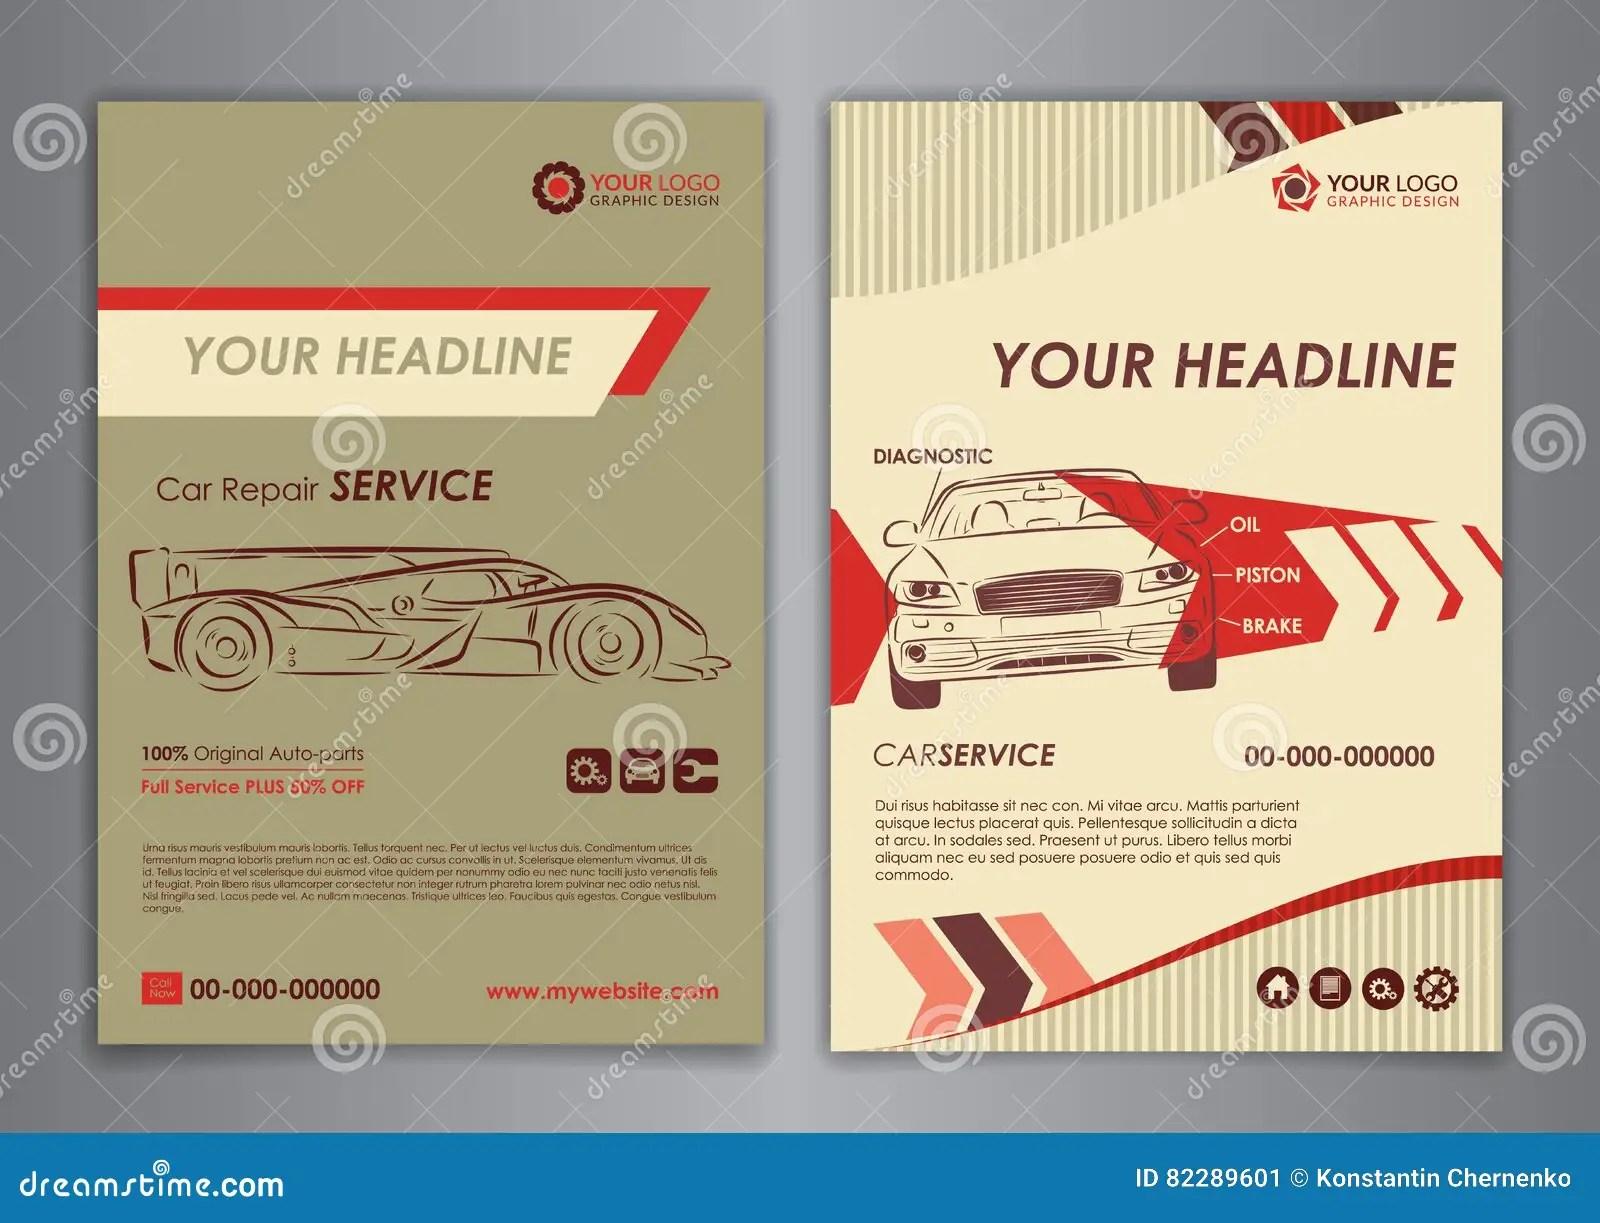 auto repair brochure templates